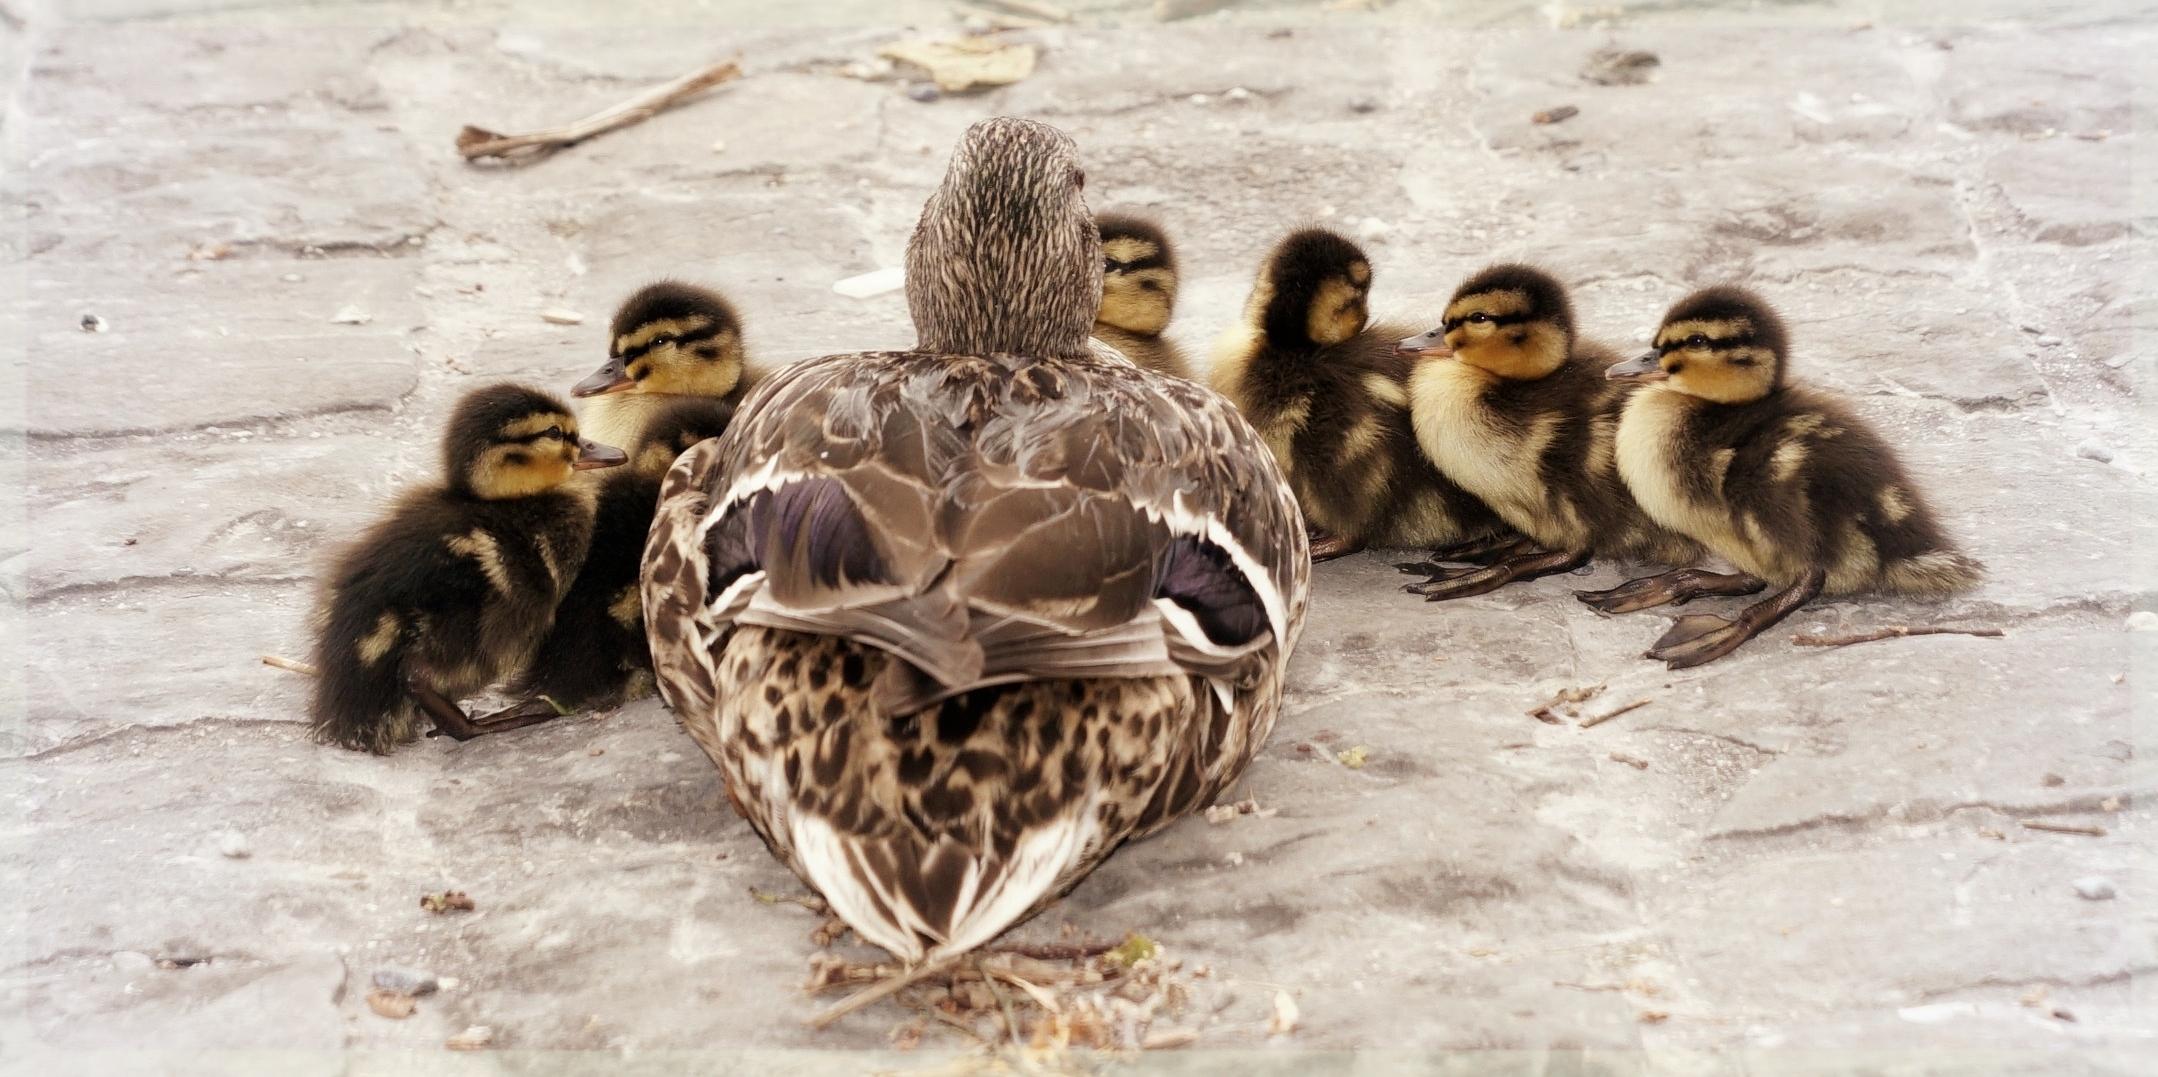 ducks-in-a-row.jpeg